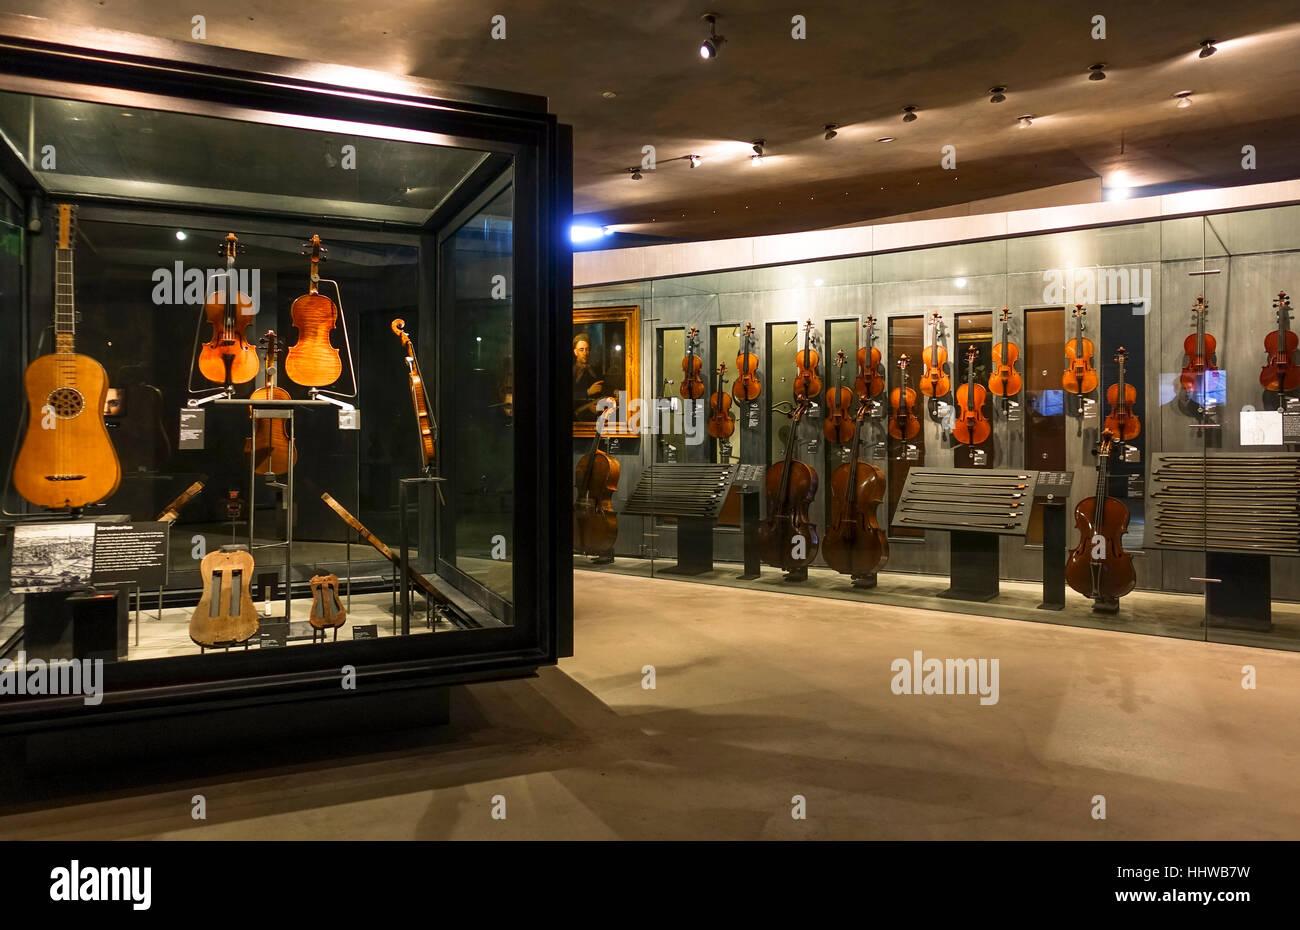 Old violines and guitars on display in Interior musée de la cite, museum, Cite de la musique, Paris, France. - Stock Image